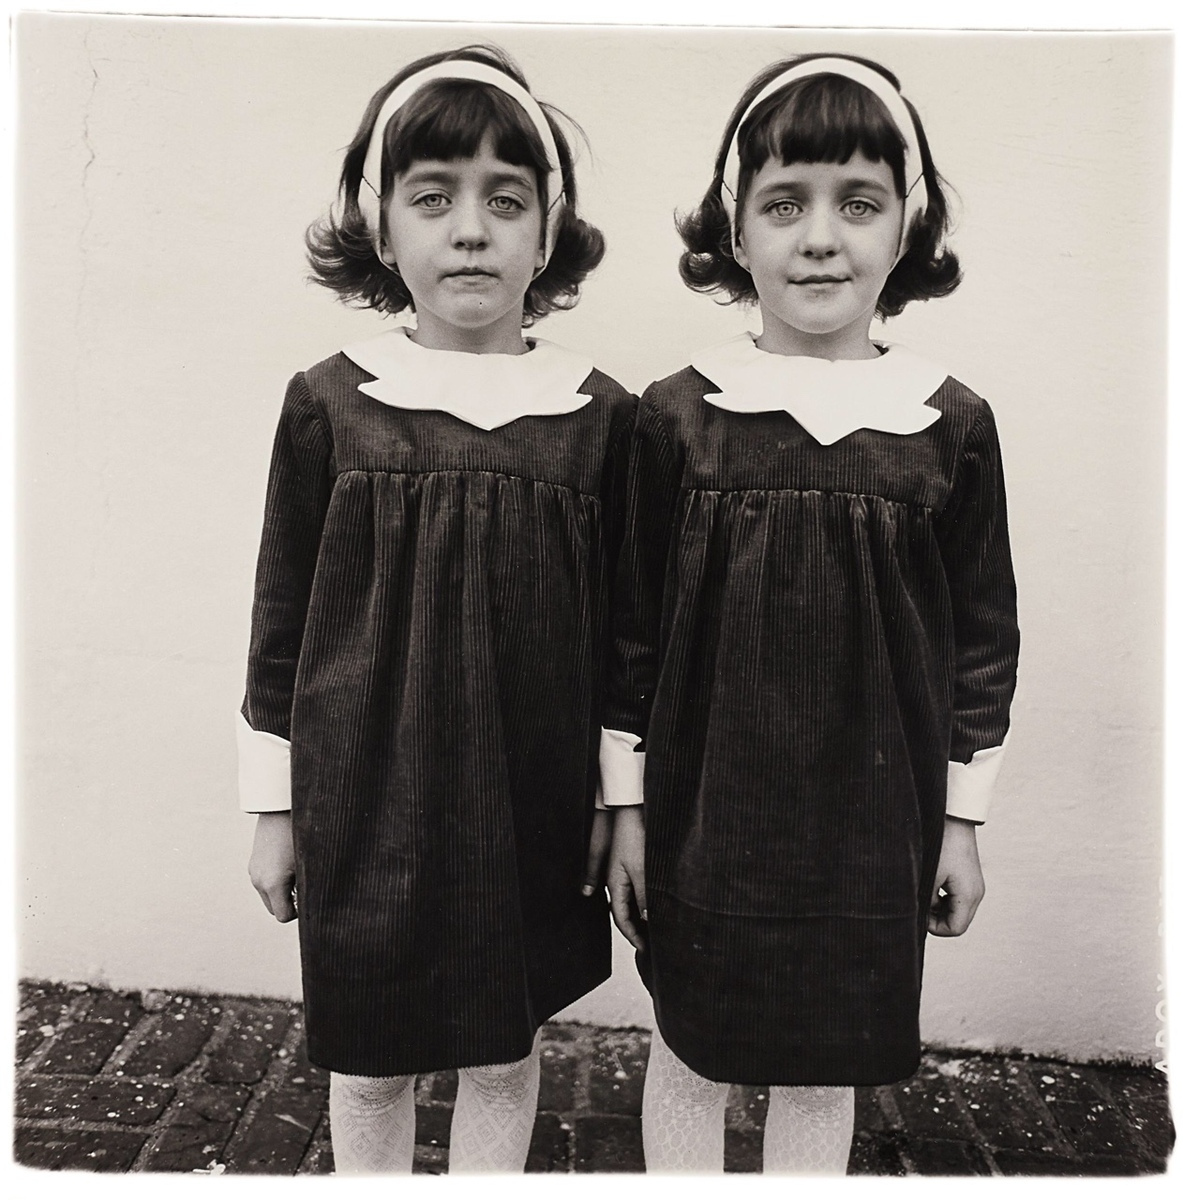 Standard twins diane arbus photo